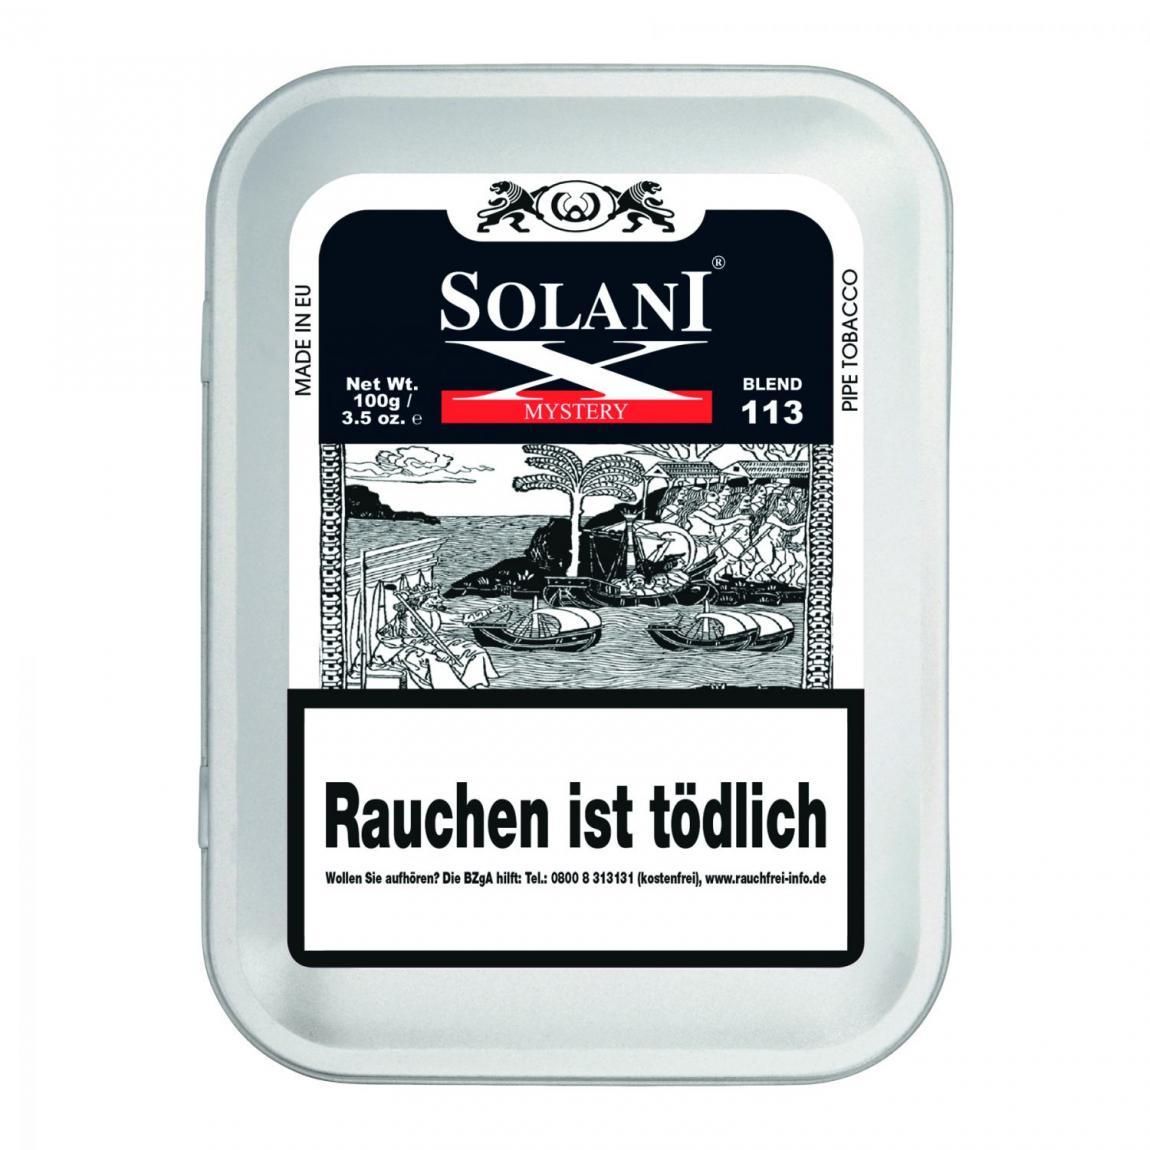 Solani Blend 113 »X Mystery« 100g Dose